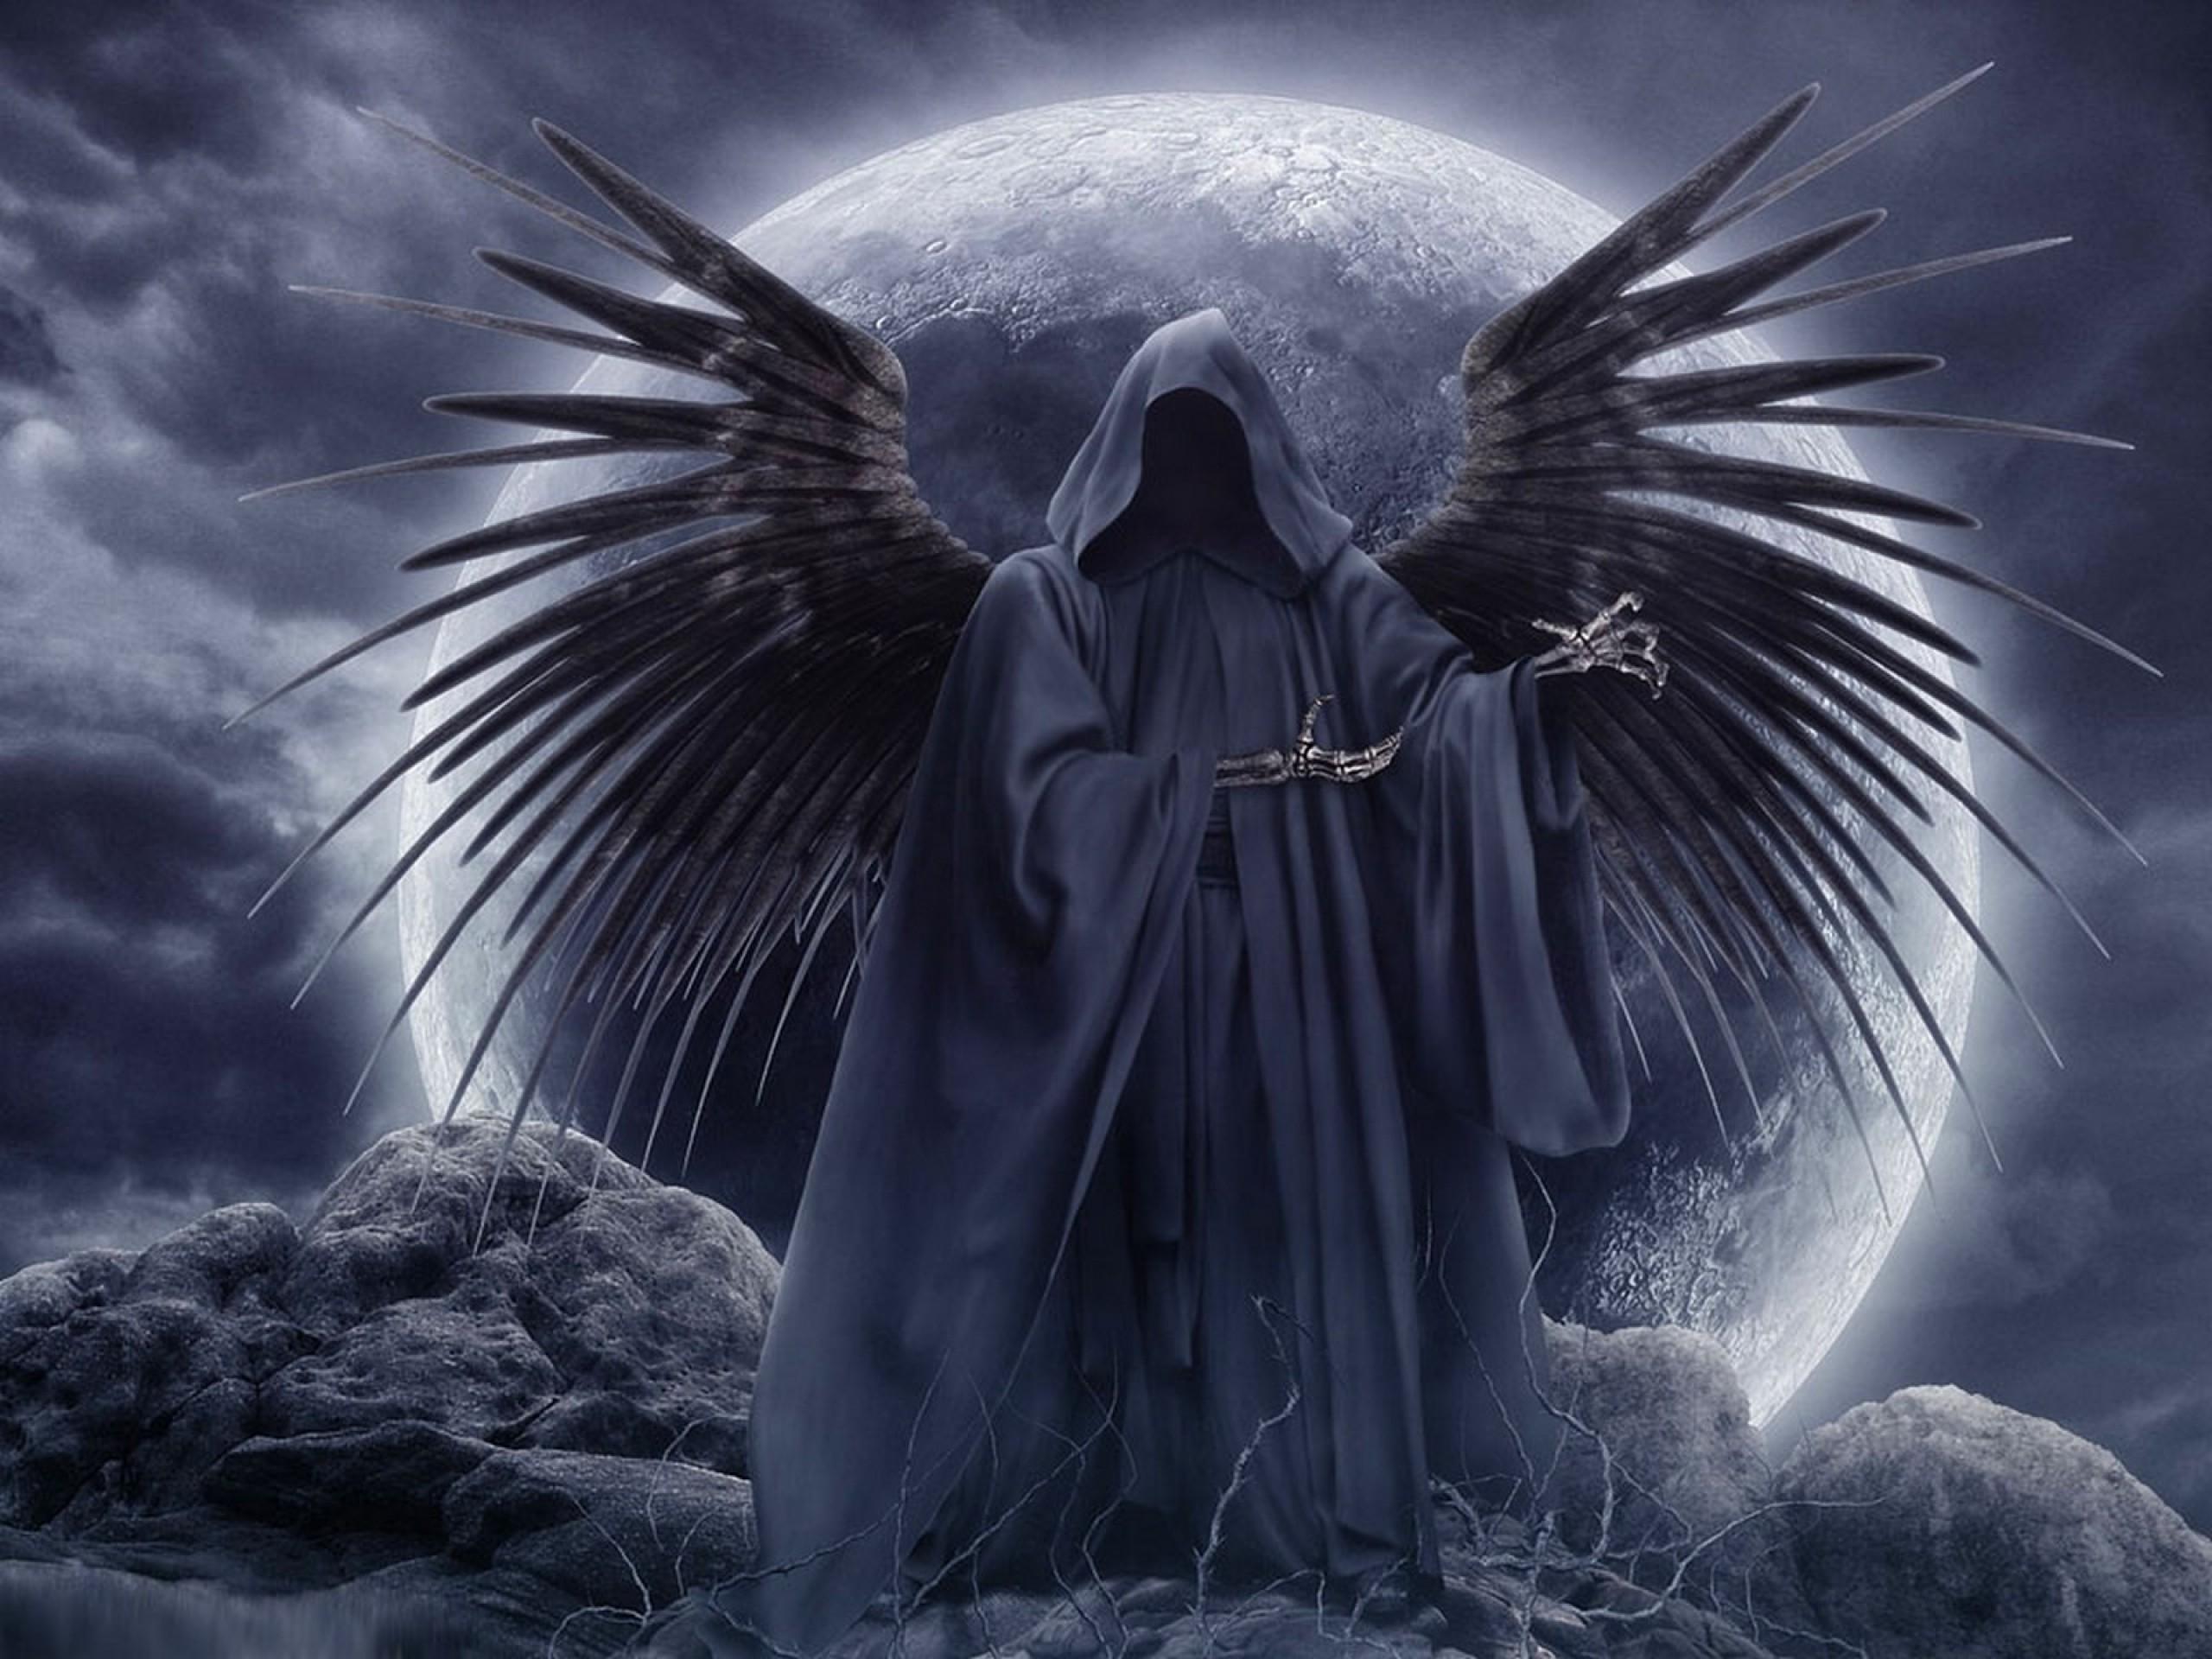 Drawn grim reaper angel wing Skyscapes ideas Best wings moon